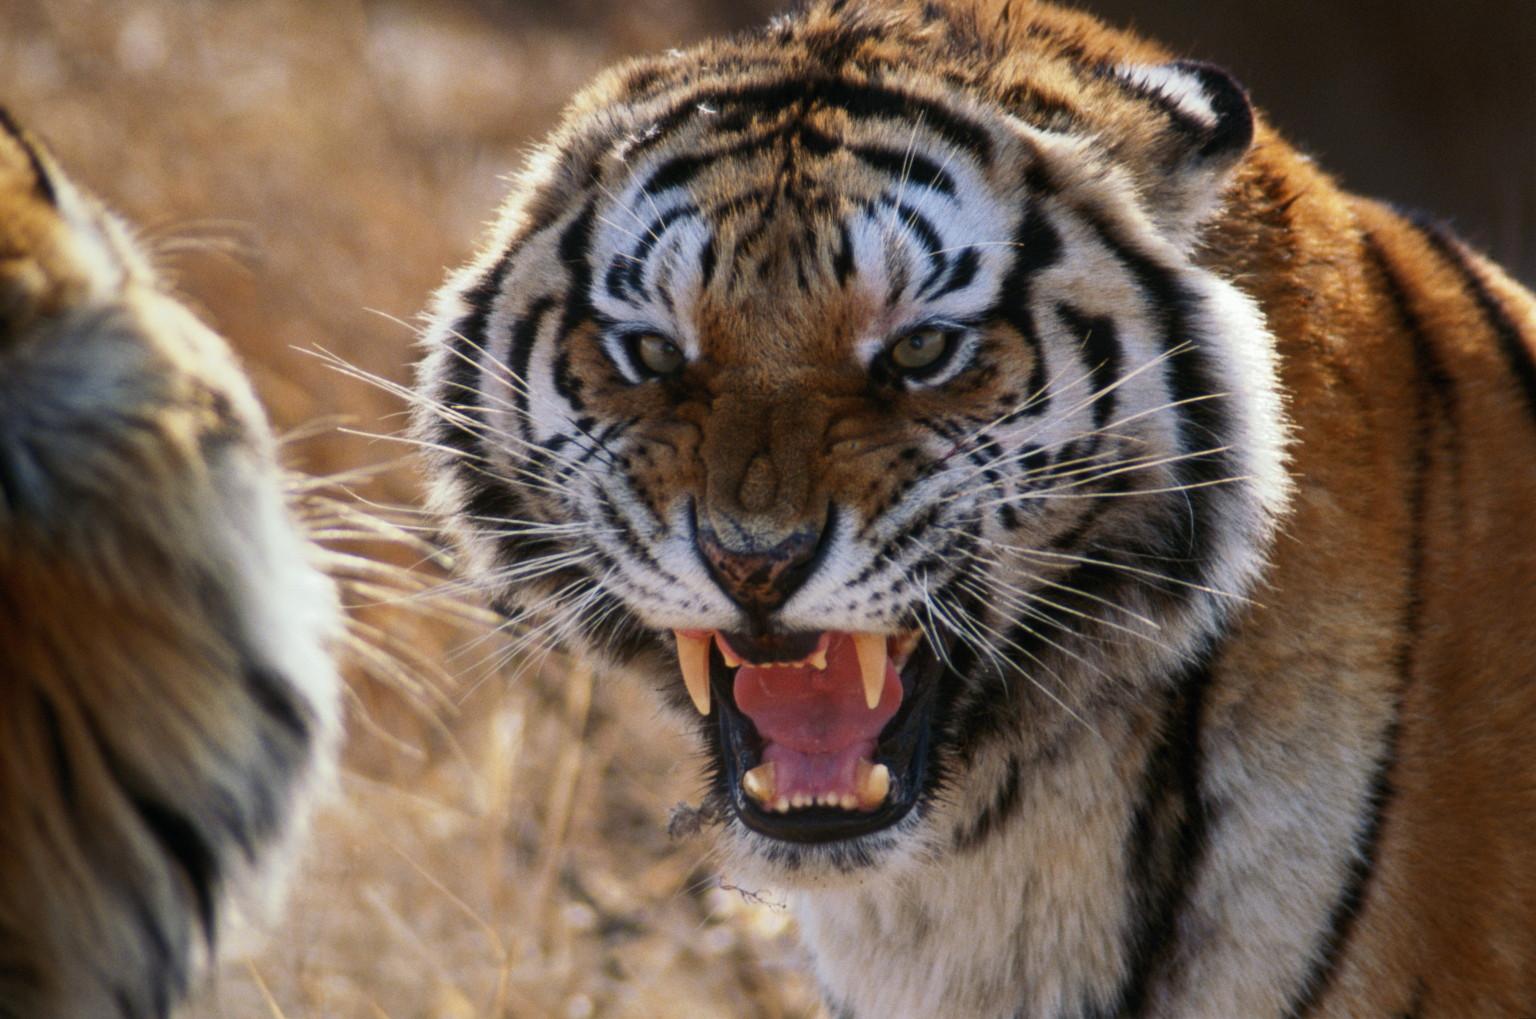 Tiger Training In Malibu Residential Area Raises Concerns